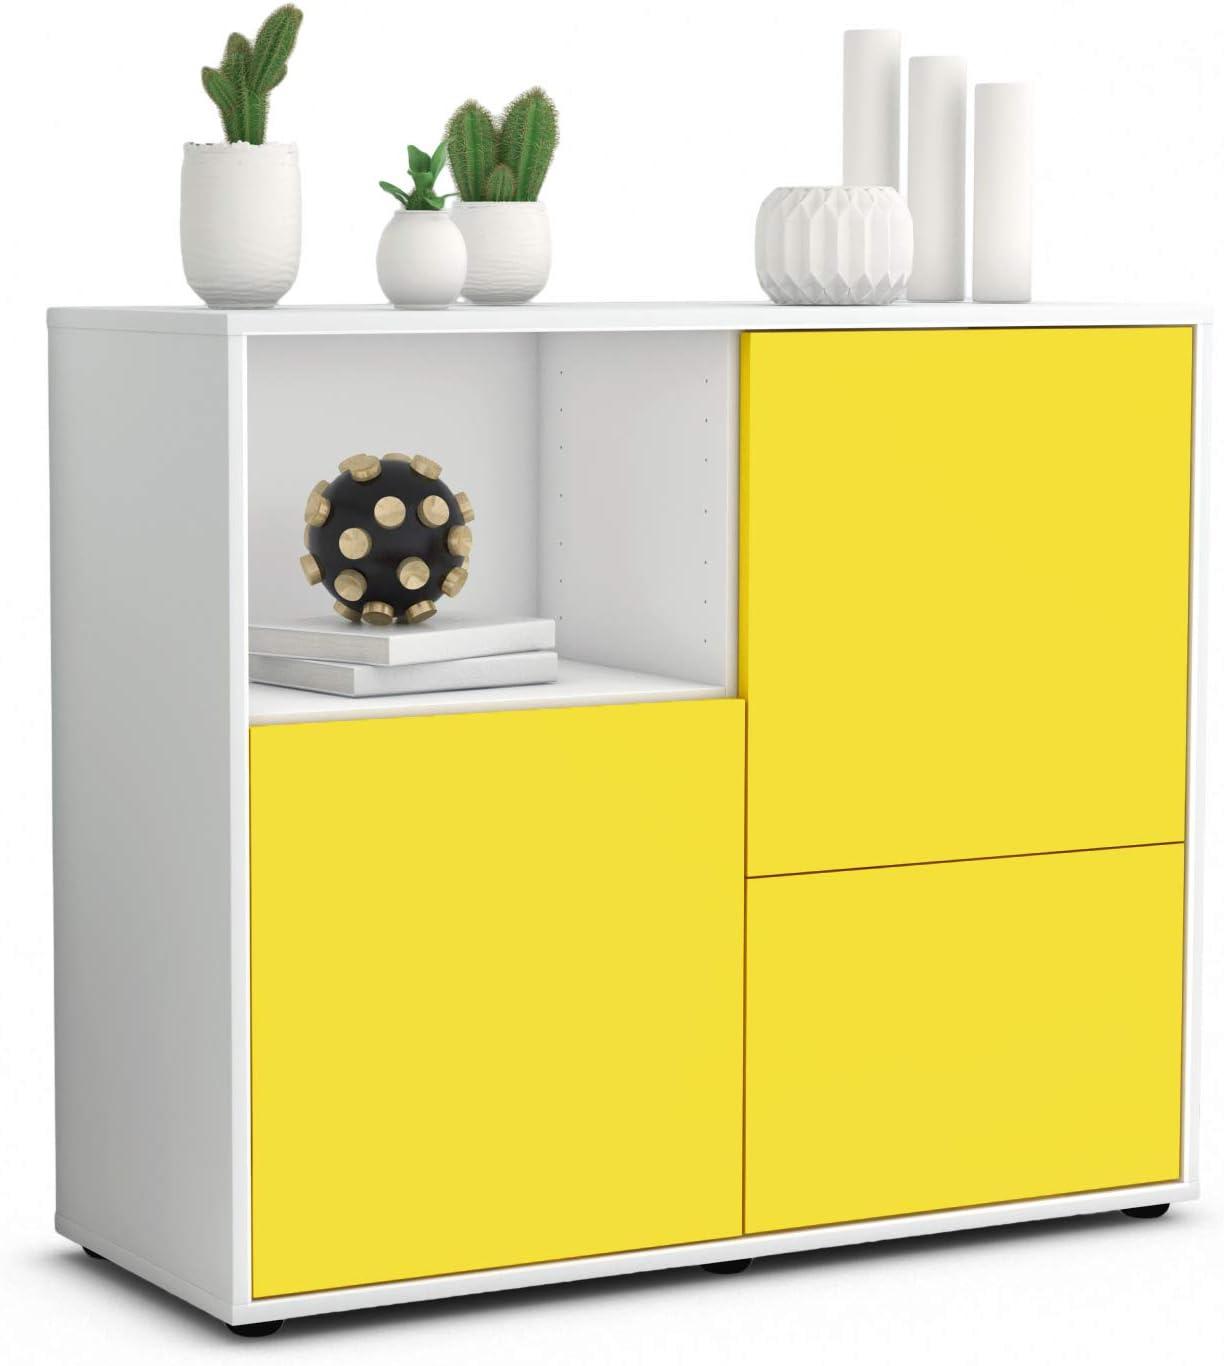 Stil.Zeit Sideboard Carina//Korpus Weiss matt//Front Lagunenblau 92x79x35cm Push-to-Open Technik